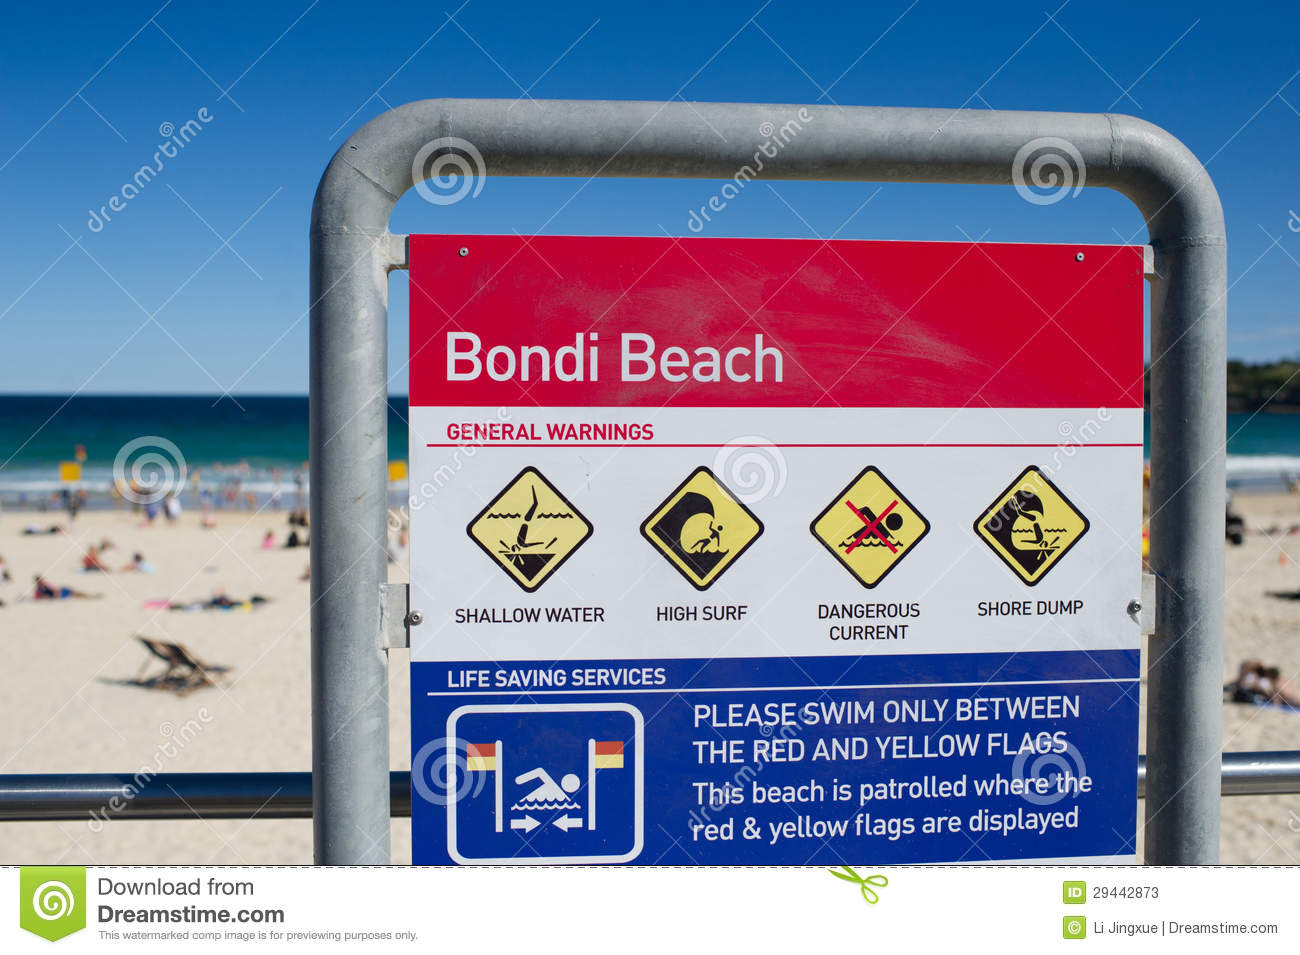 Bondi beach clipart.